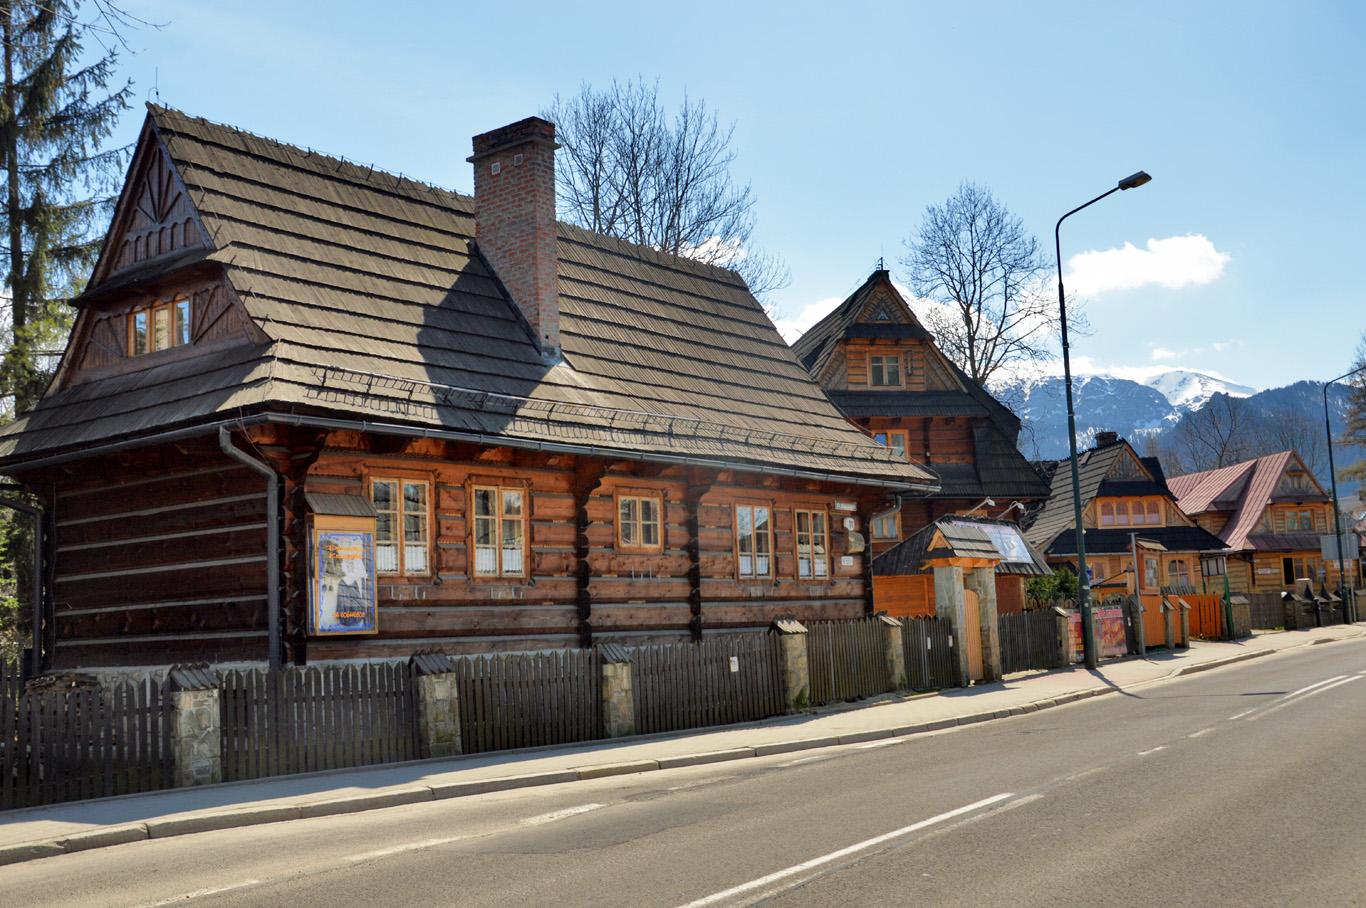 Old wooden huts - Koscieliska street